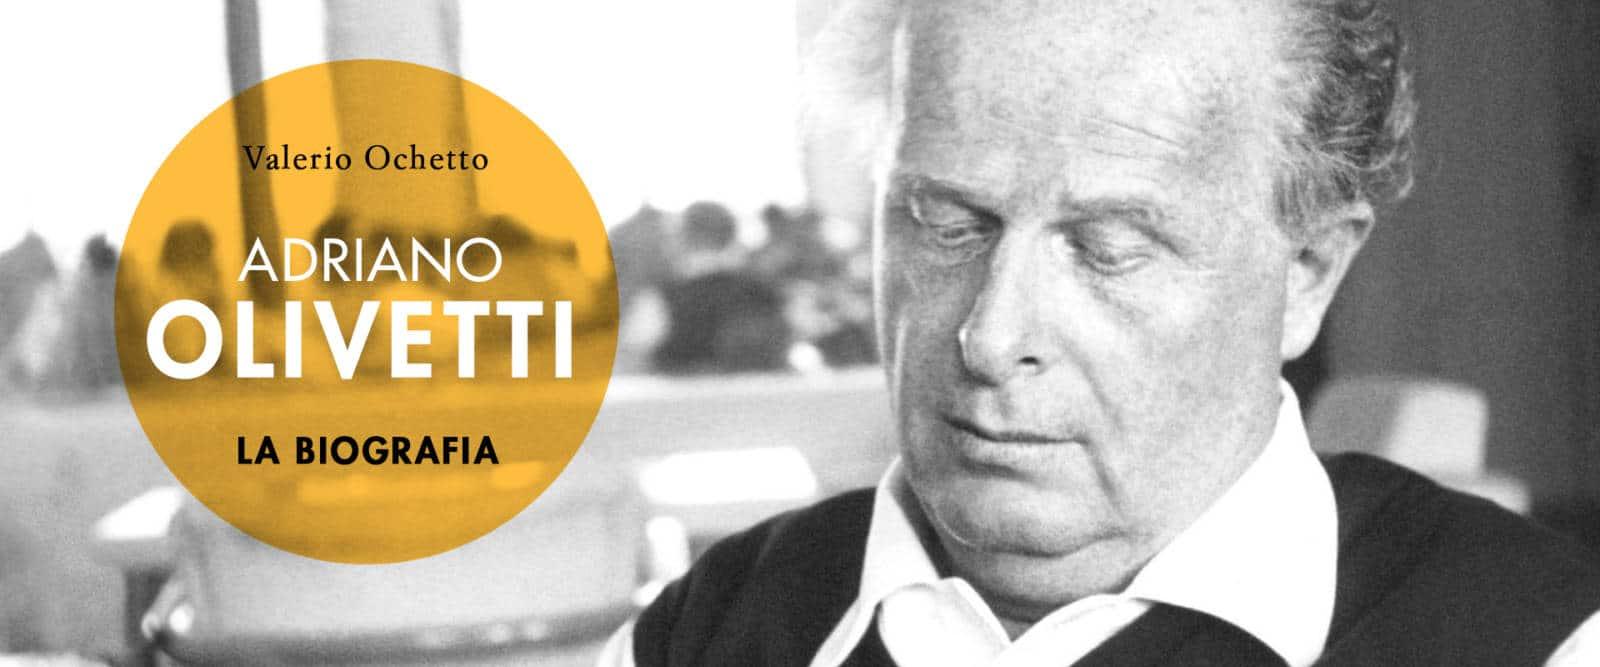 Adriano Olivetti - Slide